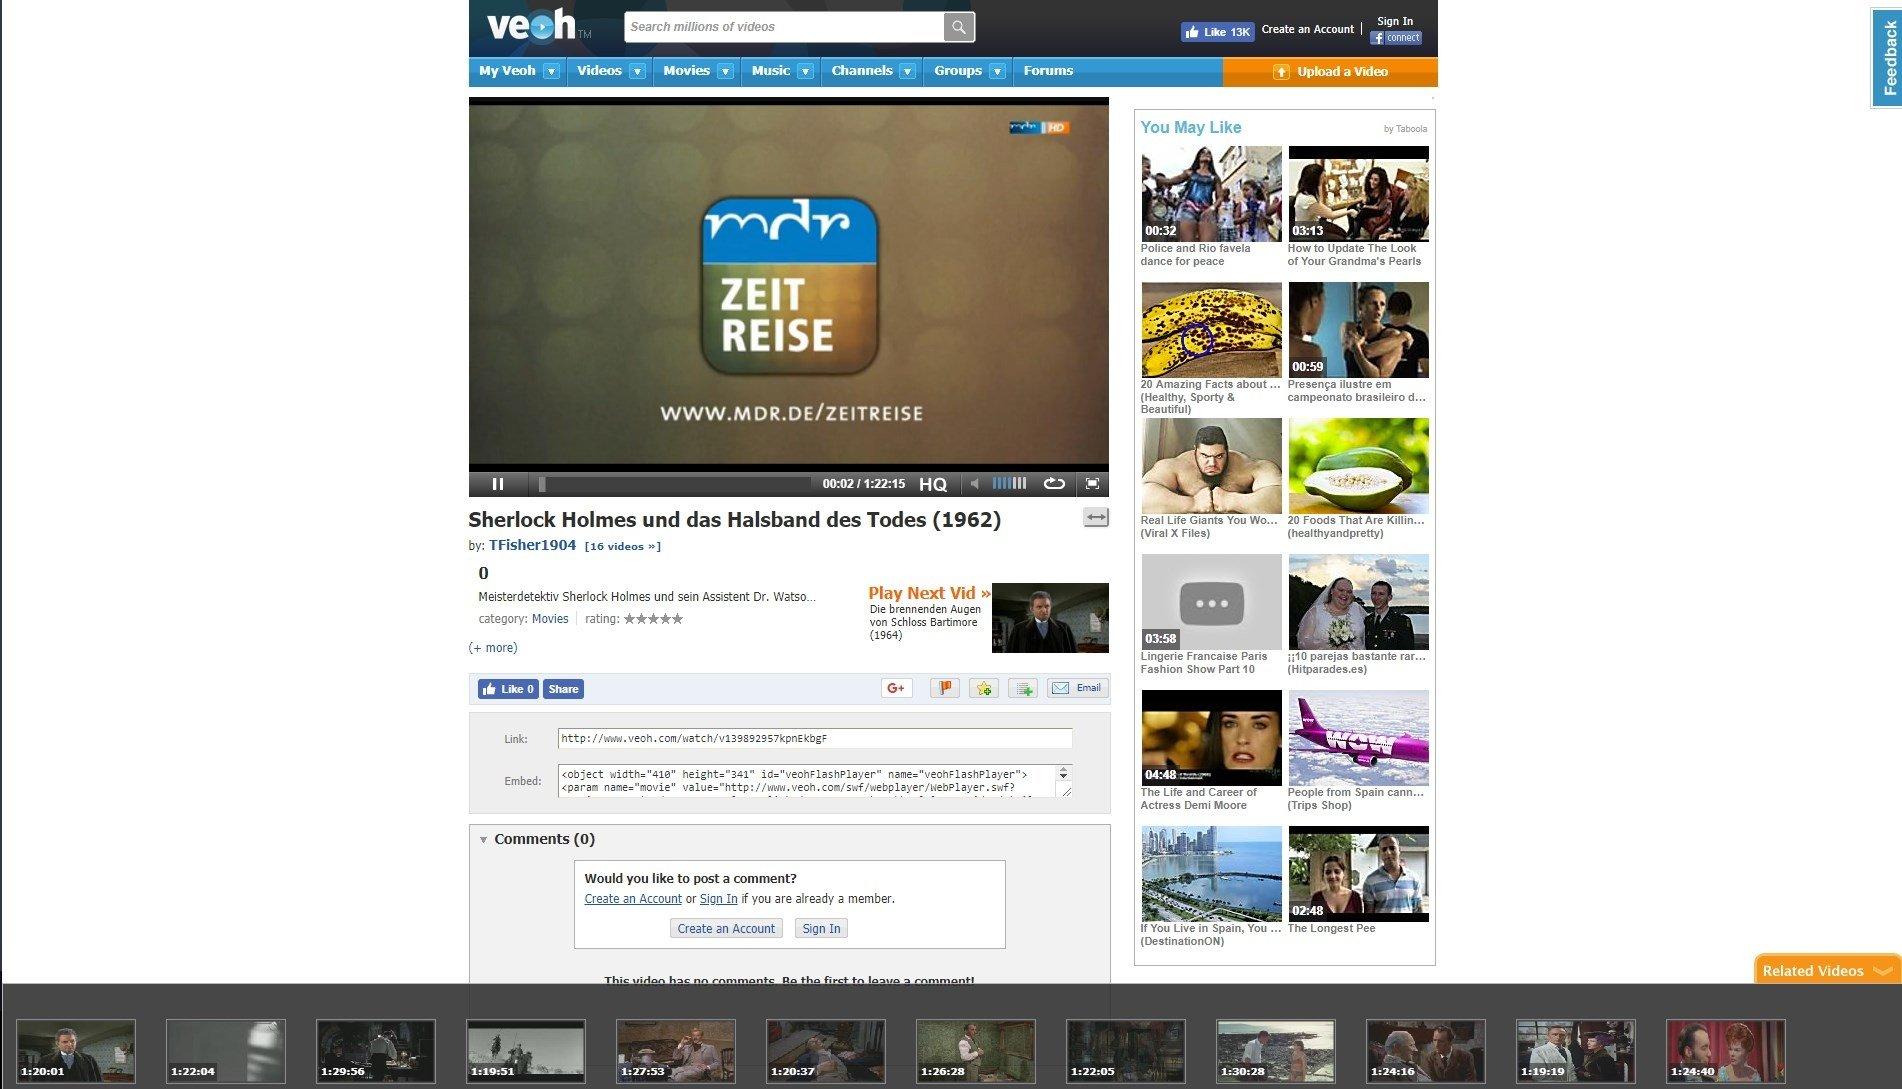 Veoh | online content analysis.